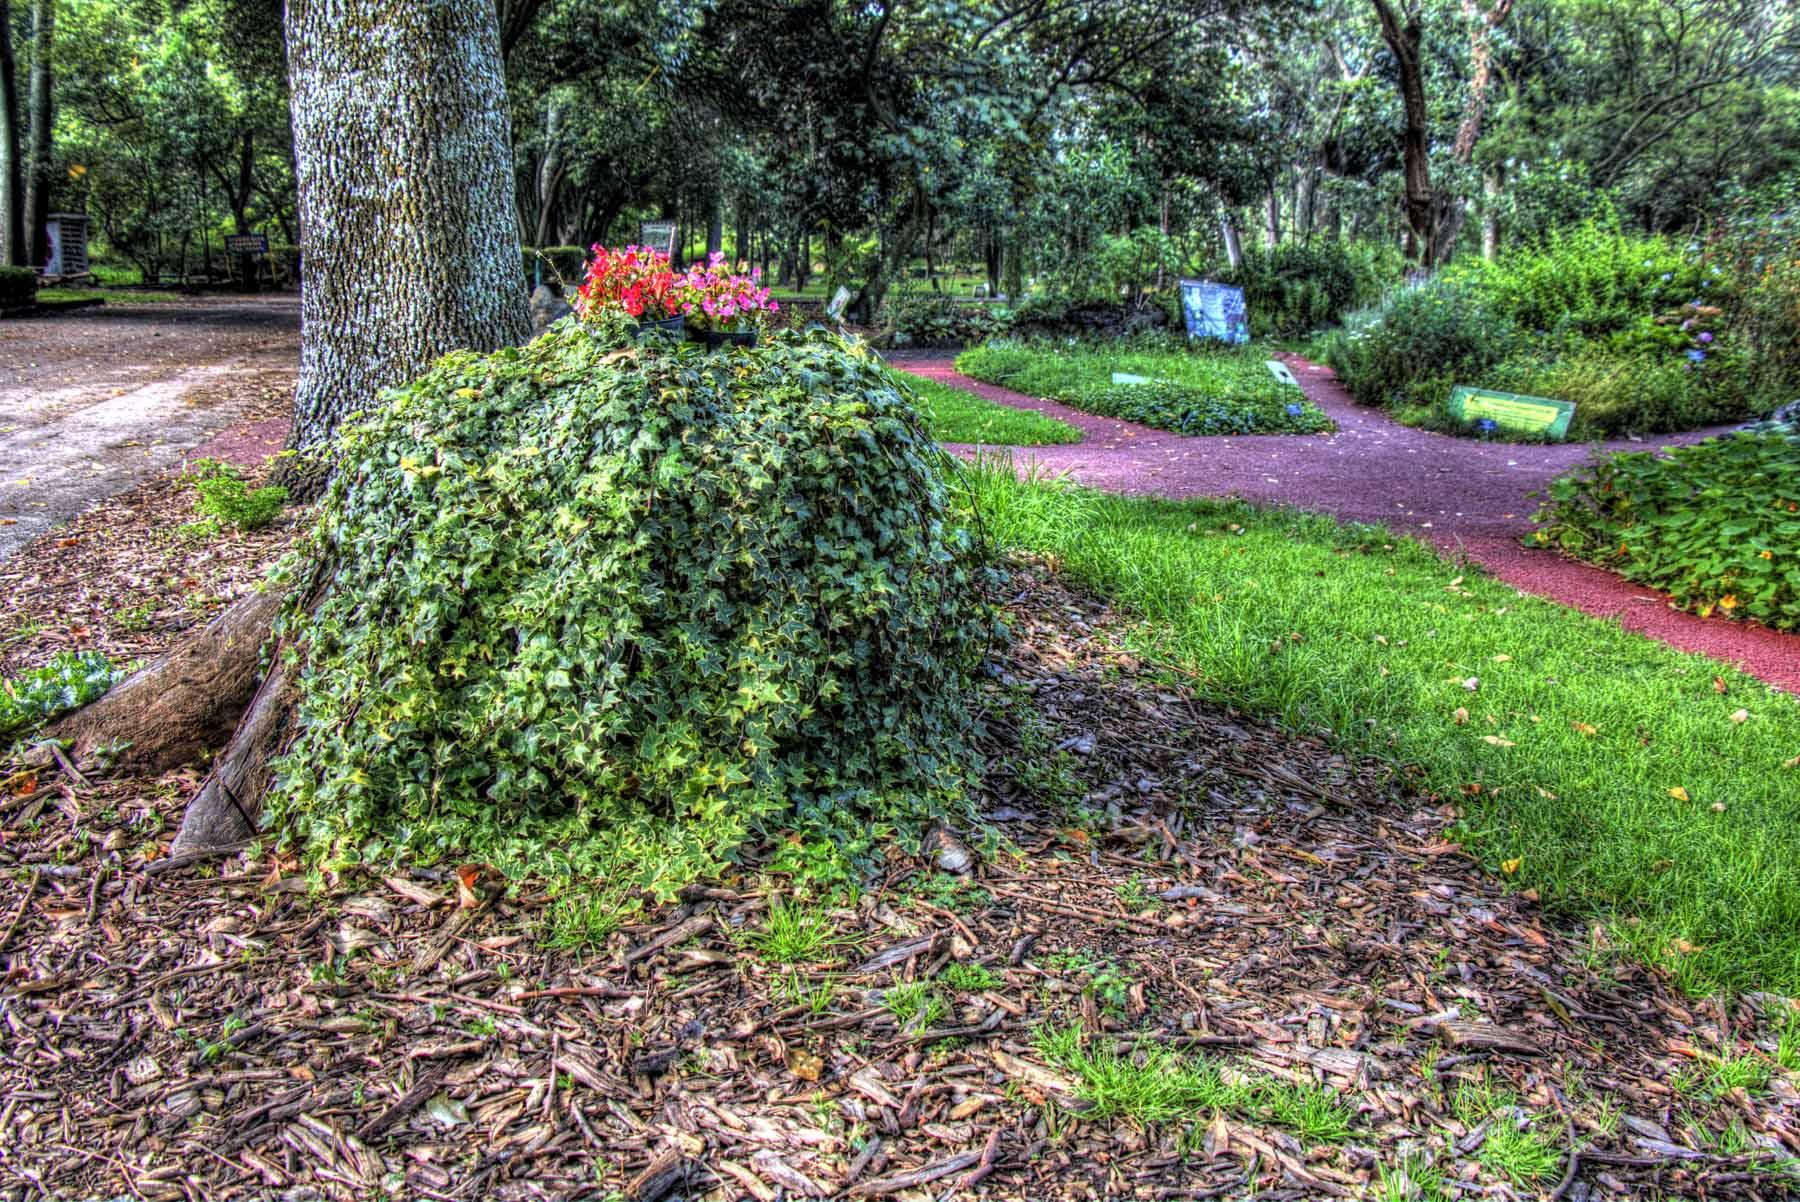 Jard n bot nico de la unam sansanphoto for Jardin botanico unam 2015